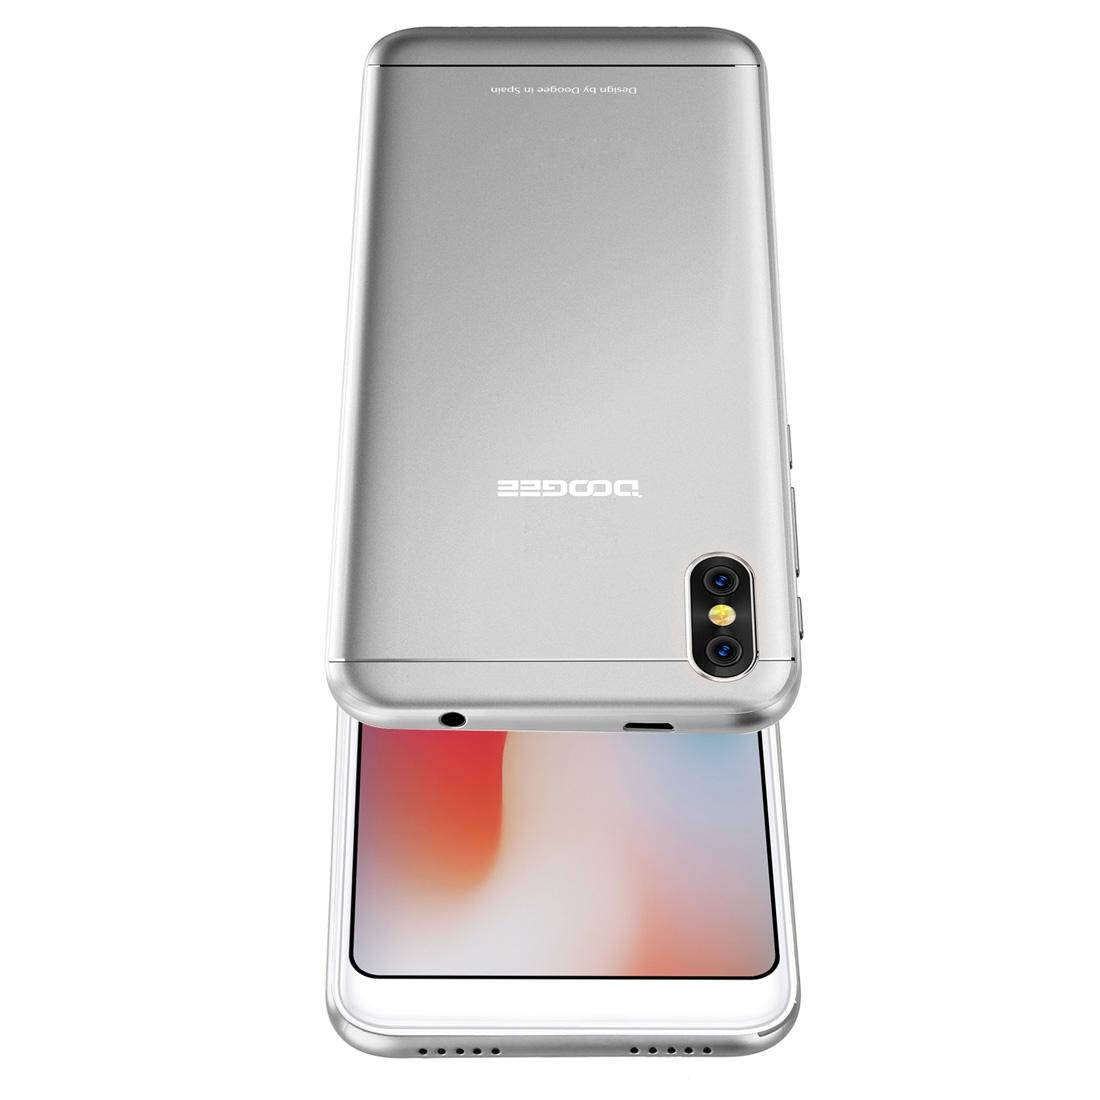 Проектор Смартфон DOOGEE X53 1GB+16GB Двойная задняя камера 5.3 дюйма Android 7.0 MTK6580M 4 ядра до 1.3GHz 3G OTA Две SIM (Серебряный) (Фото 4)